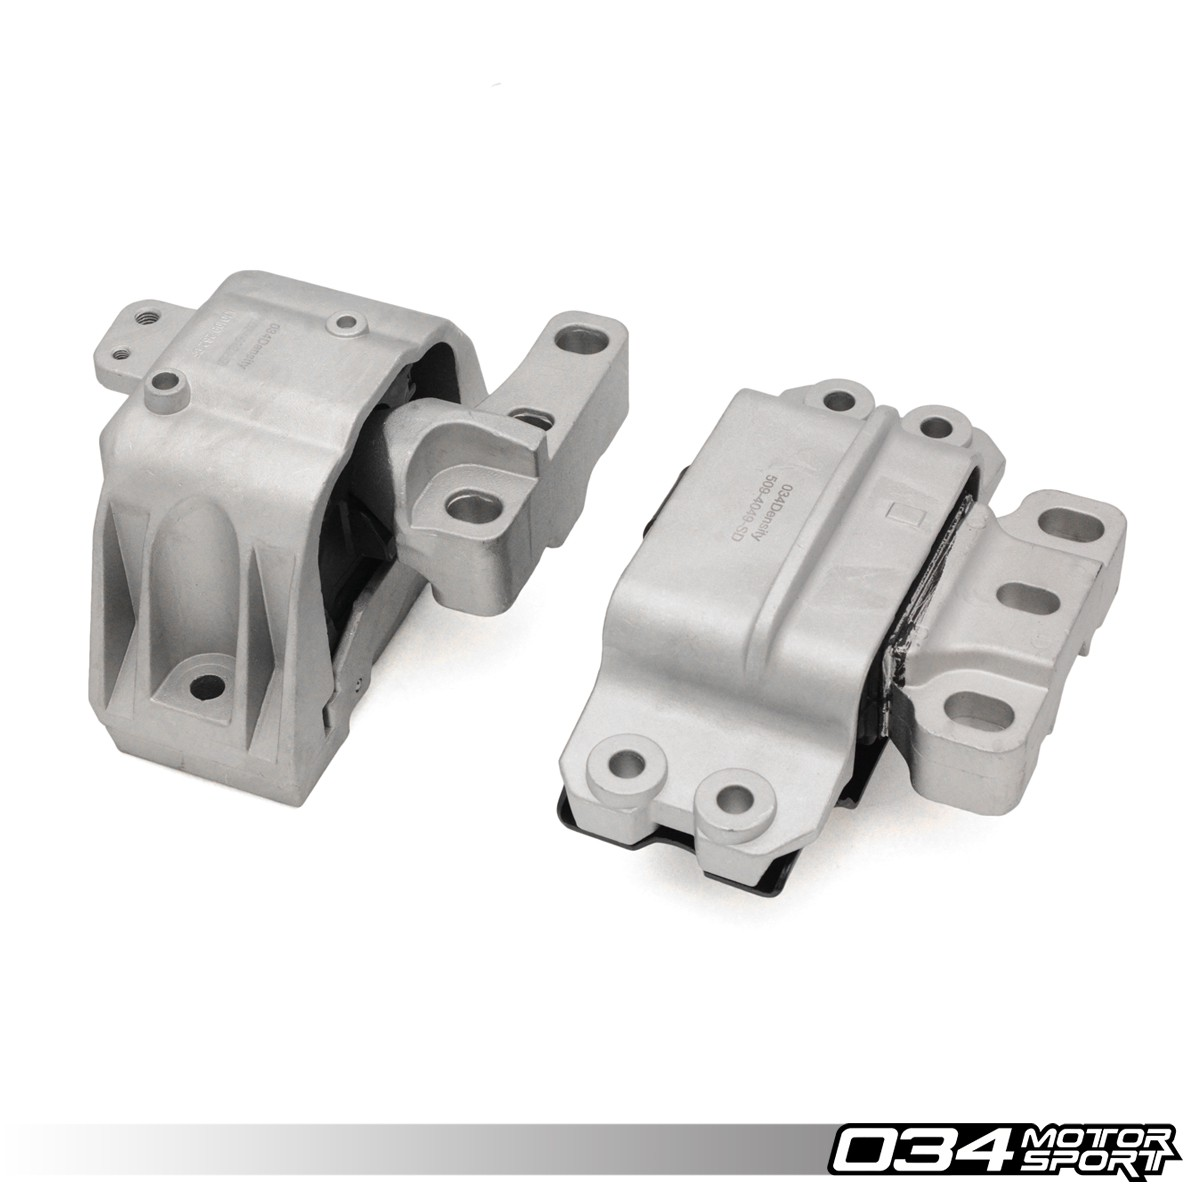 Motor Mount Pair, Street Density, MkV/MkVI Volkswagen Golf/Jetta & 8J Audi A3 2.0 TDI | 034-509-5021-SD